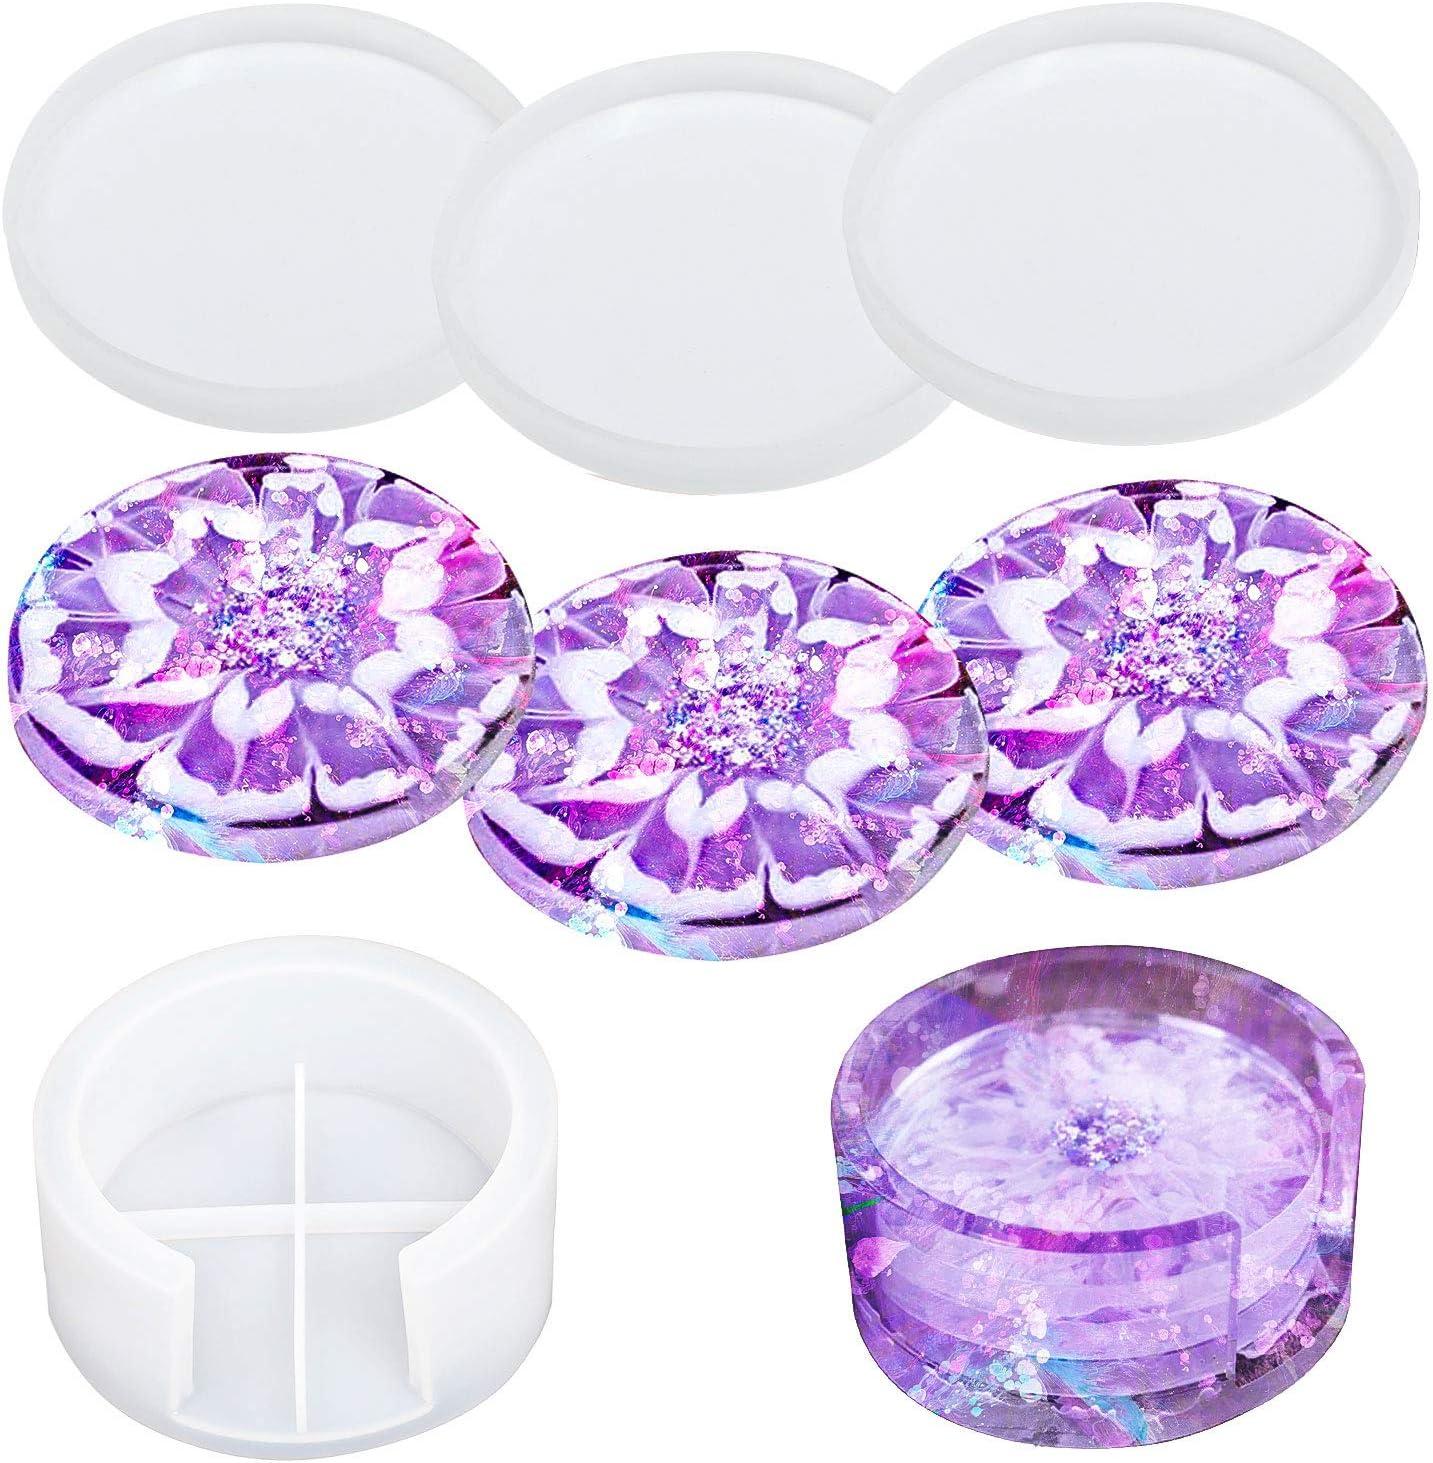 STSUNEU Coaster Molds for Resin, 4Pcs Resin Coaster Molds Kit